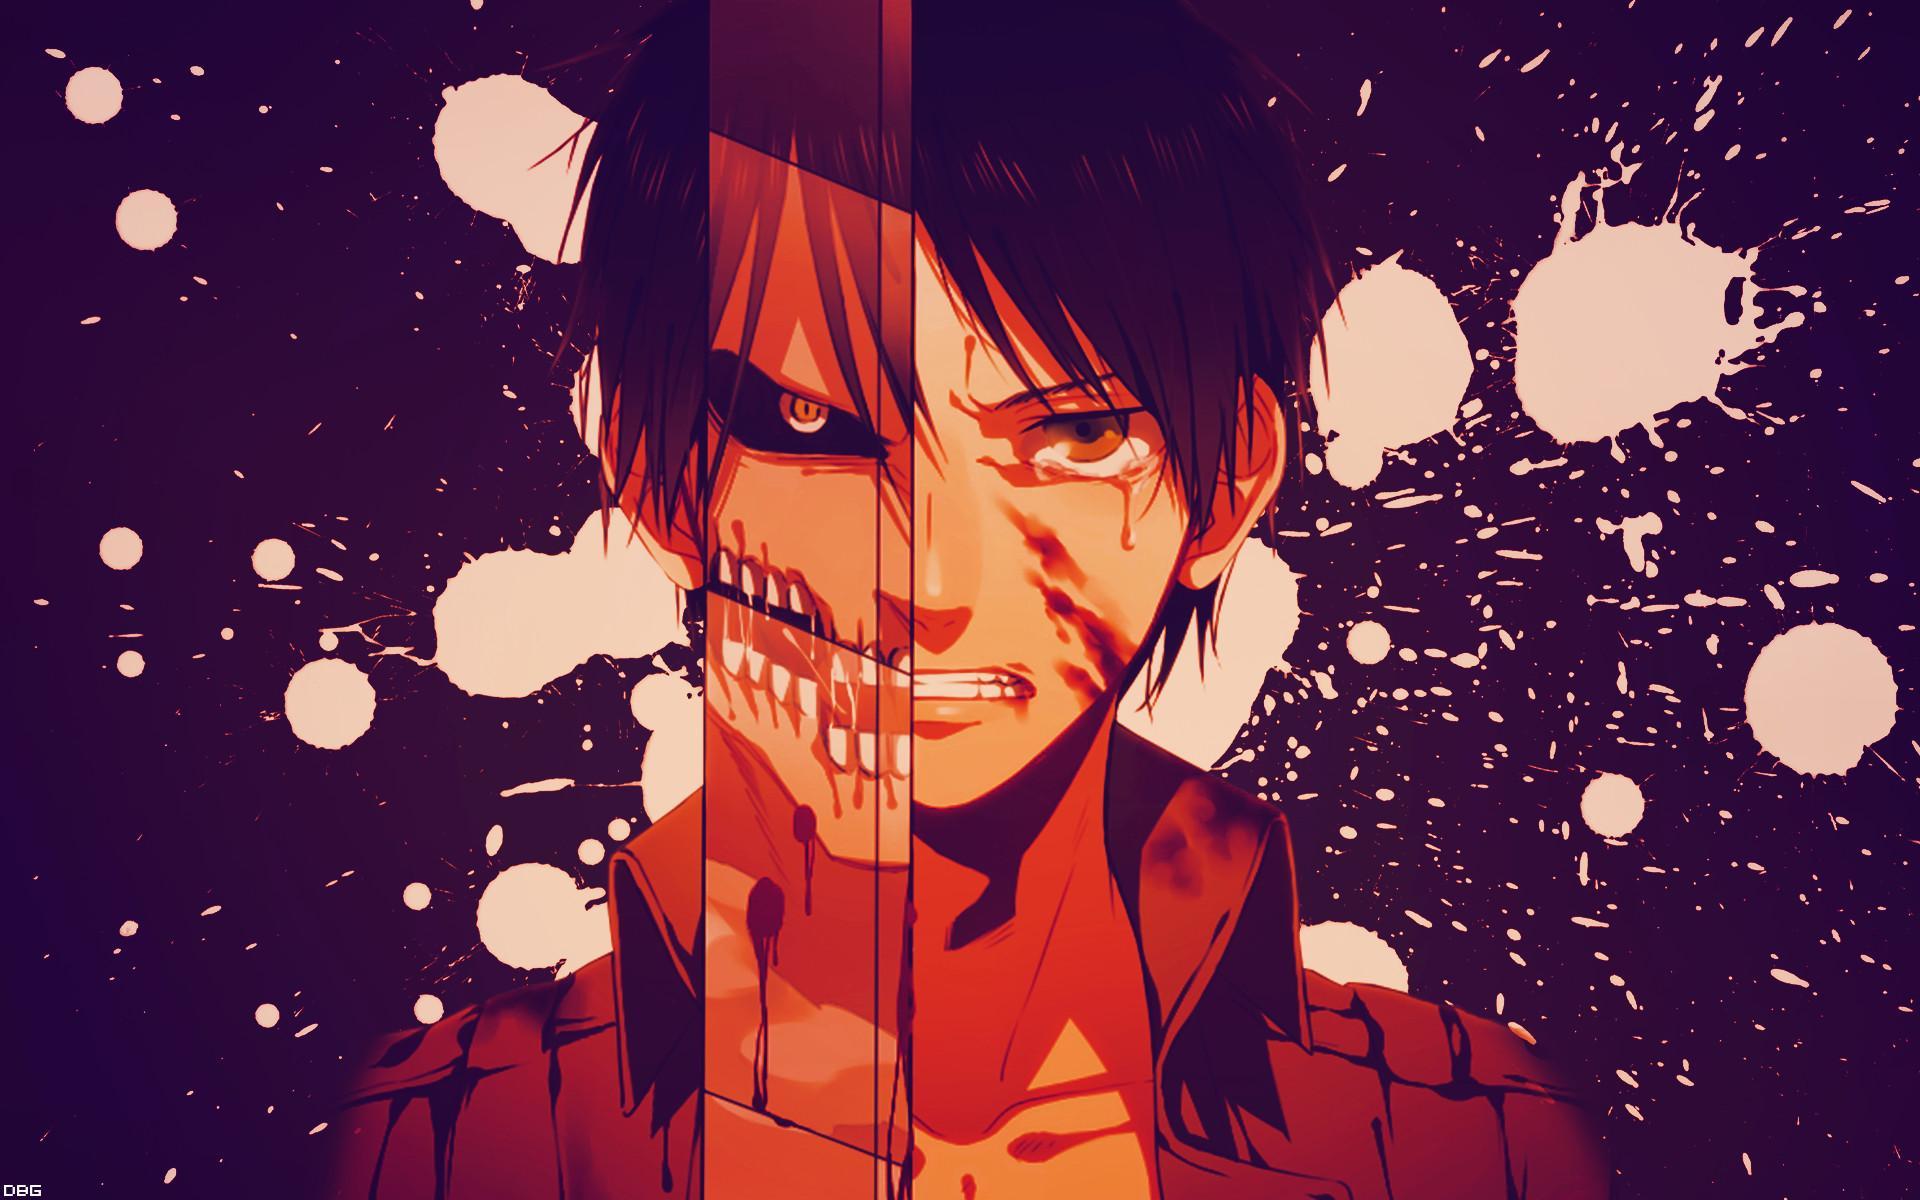 Wallpaper whatsapp lucu dan keren hd anonytun com Mengunduh Gambar Anime Aot Wallpapers Wallpaper Cave